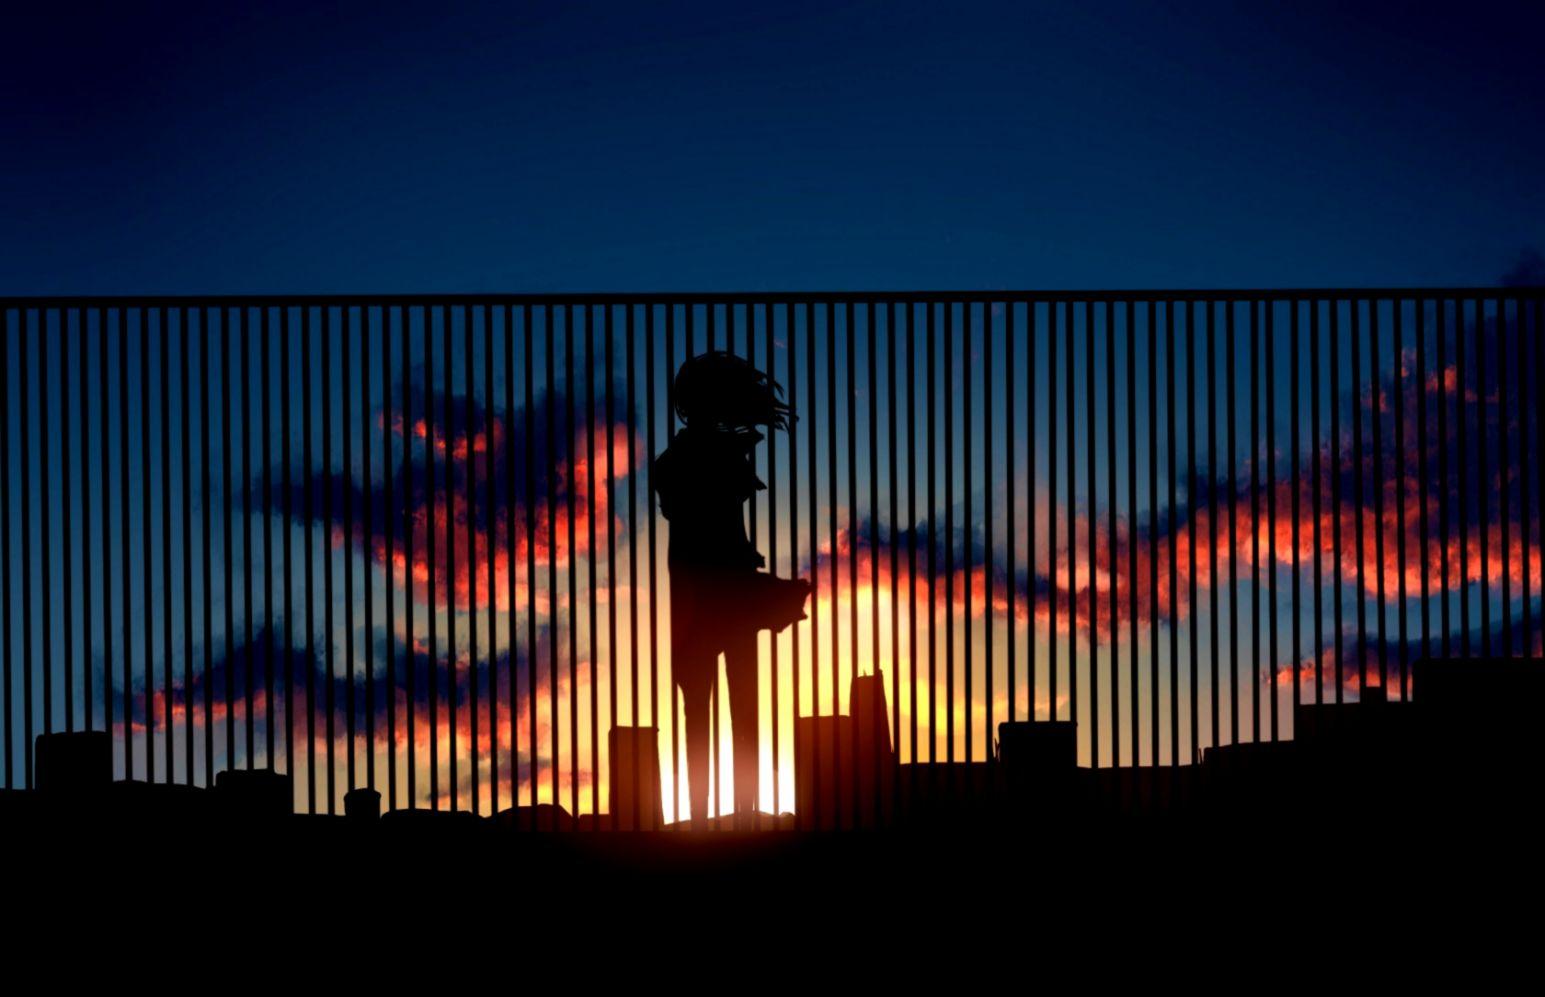 city sunset wallpaper 7106 - photo #32